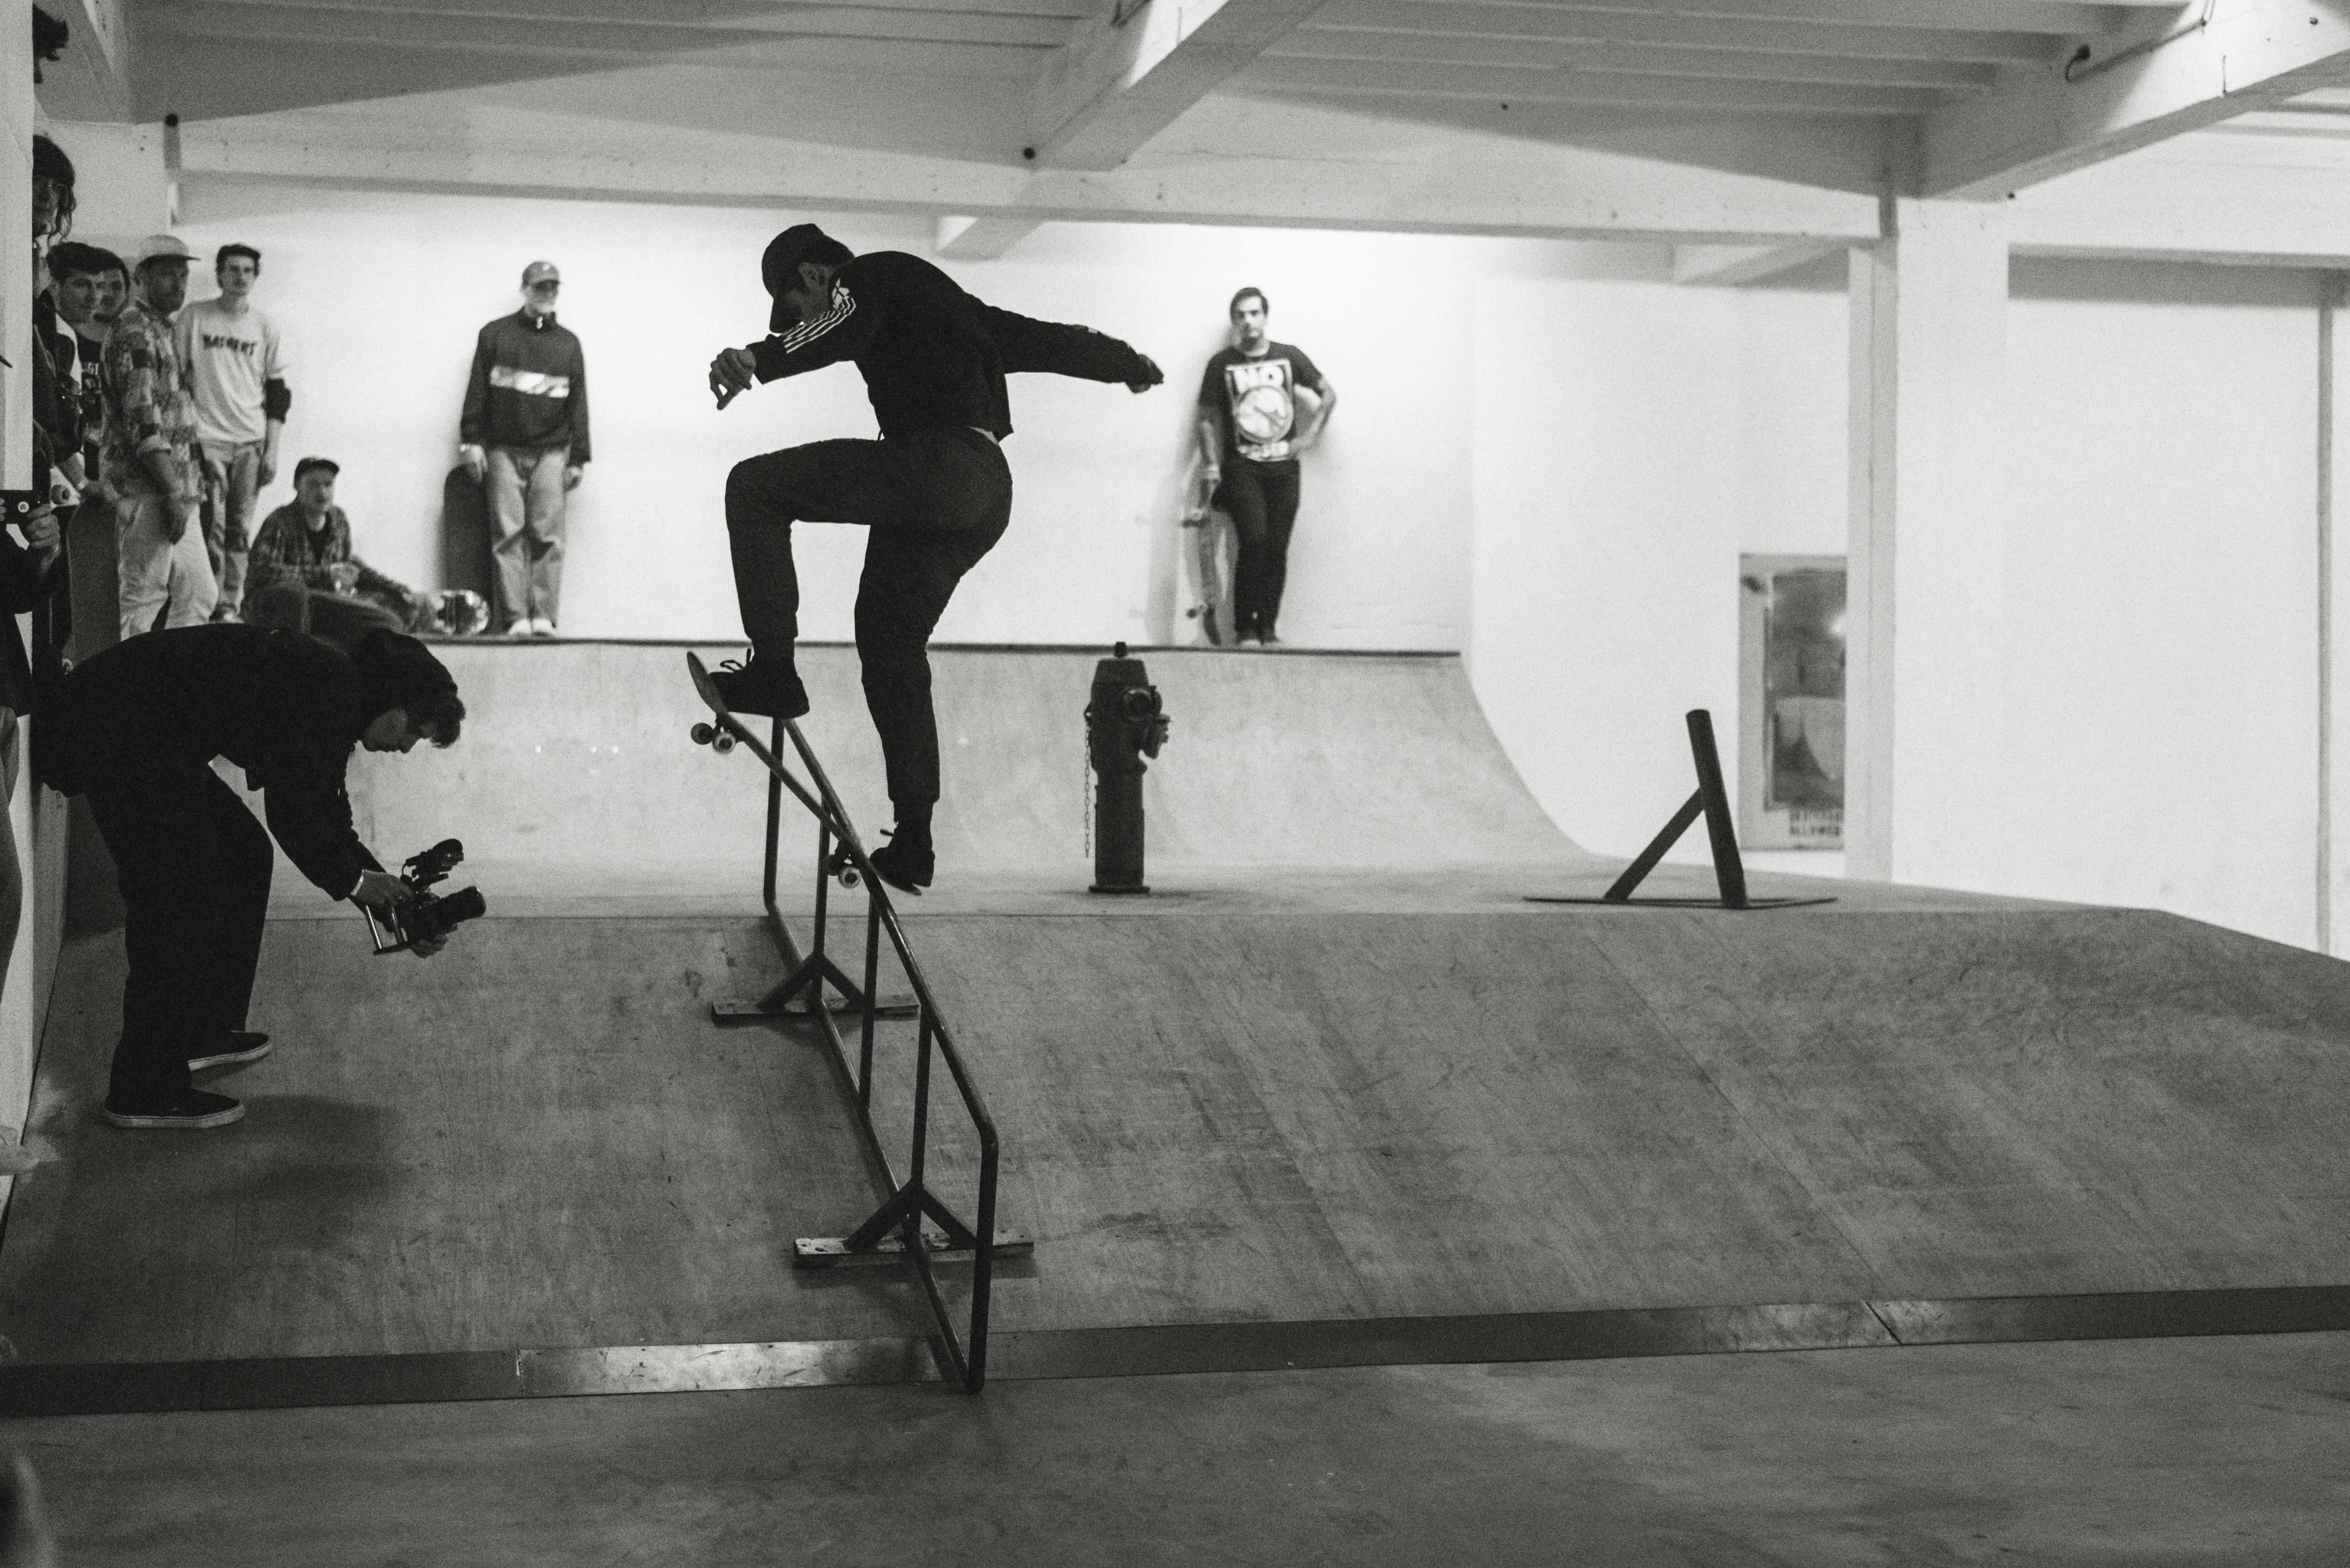 MV170506_Bruxelles_Skate_Levis_133-2